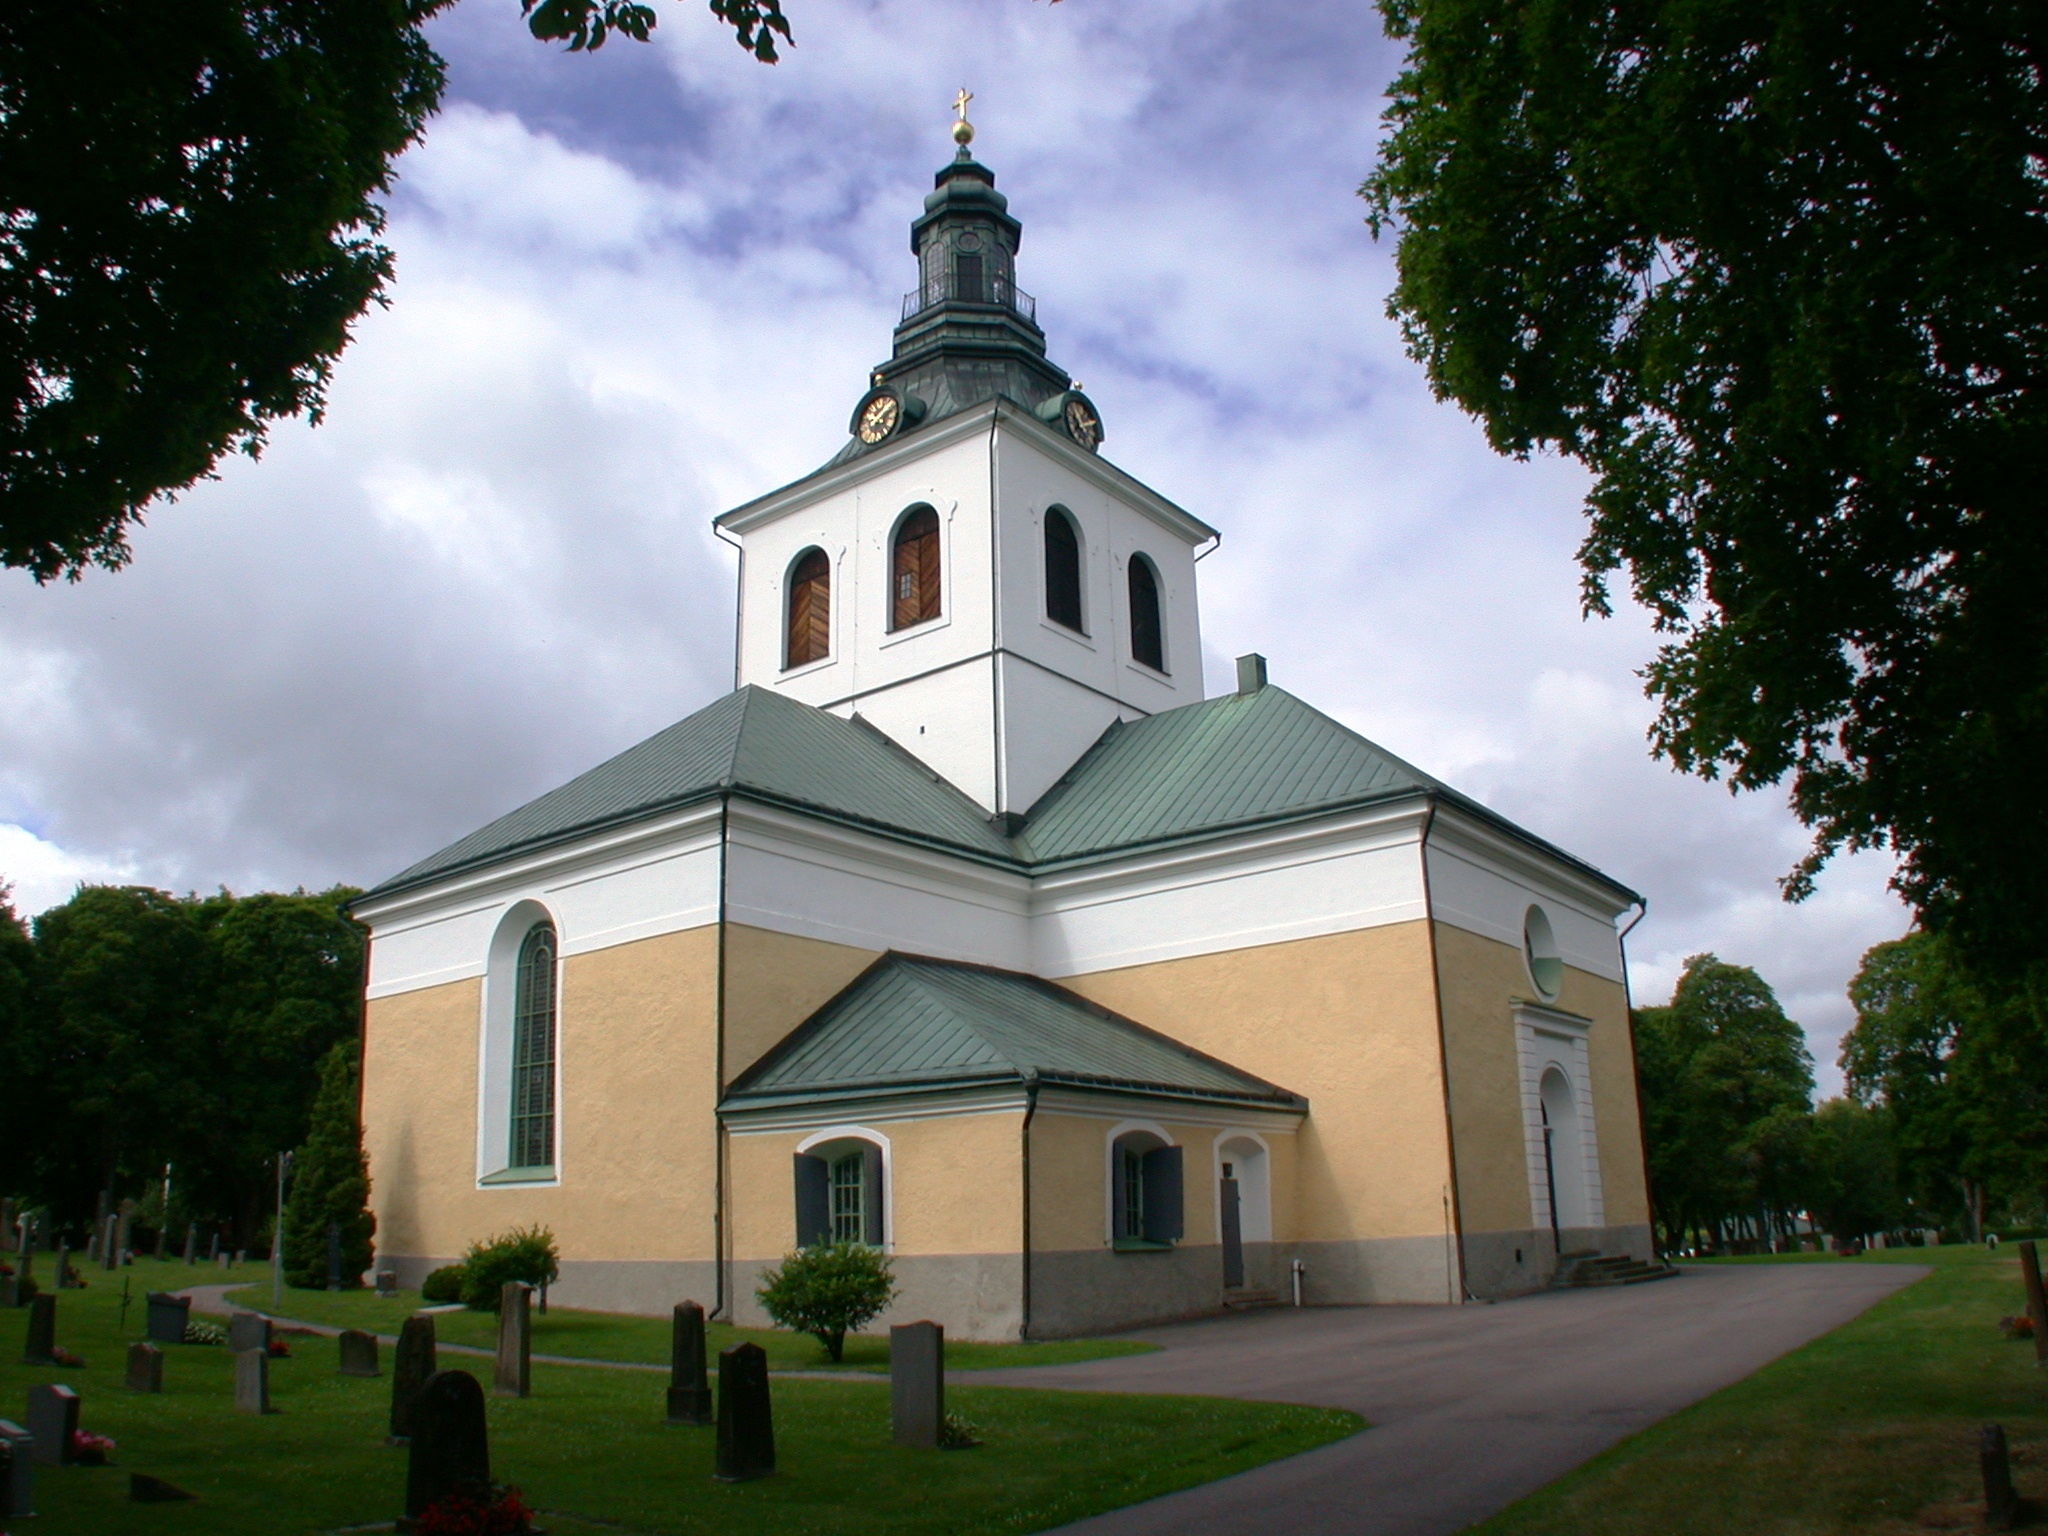 Vsterfrnebo-Flckebo frsamling - Svenska kyrkan